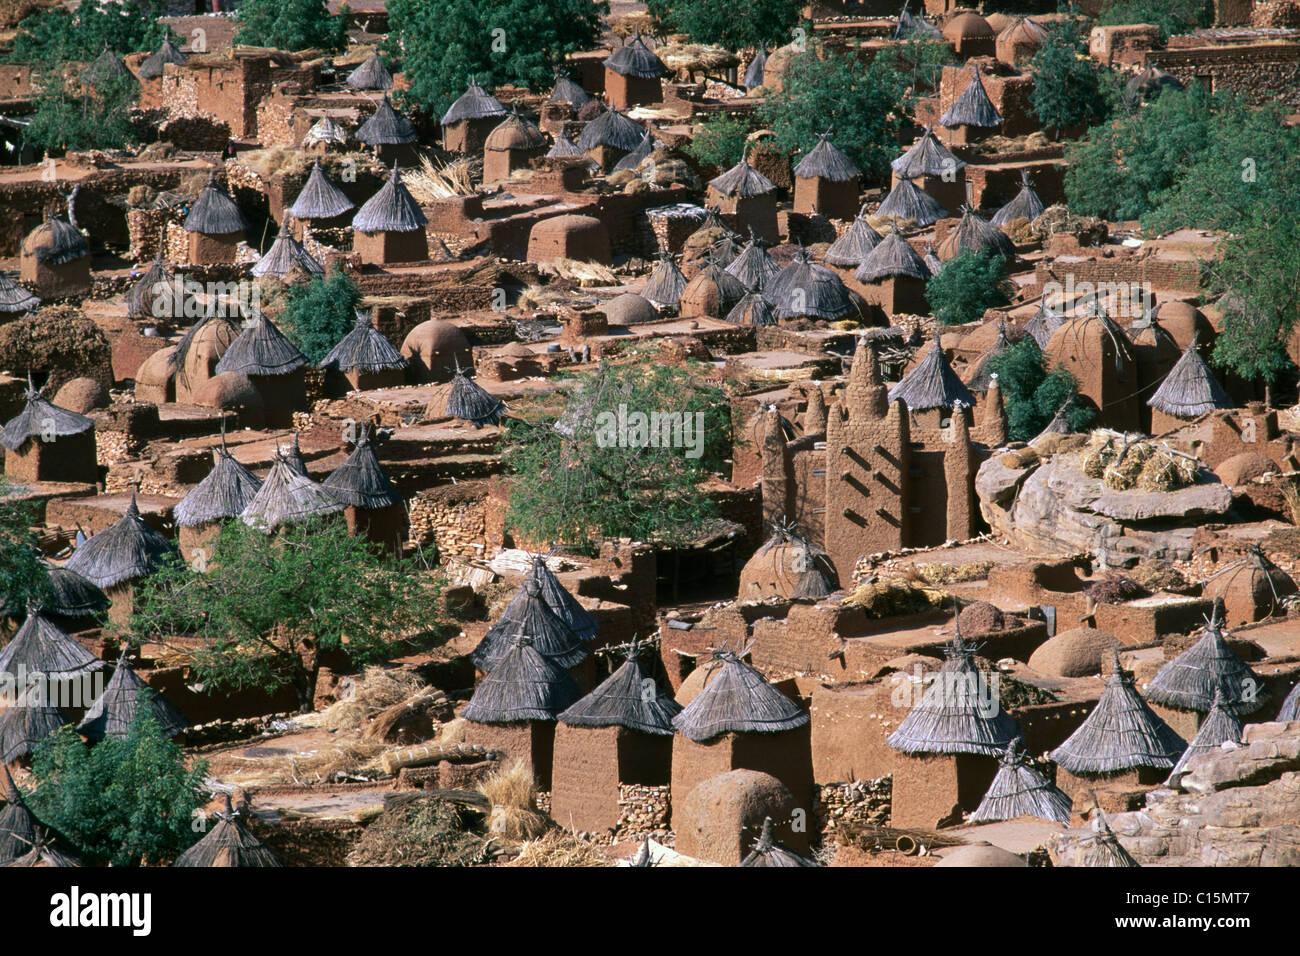 Adobe mud brick buildings in Songo, Dogon area, Mali, Africa - Stock Image